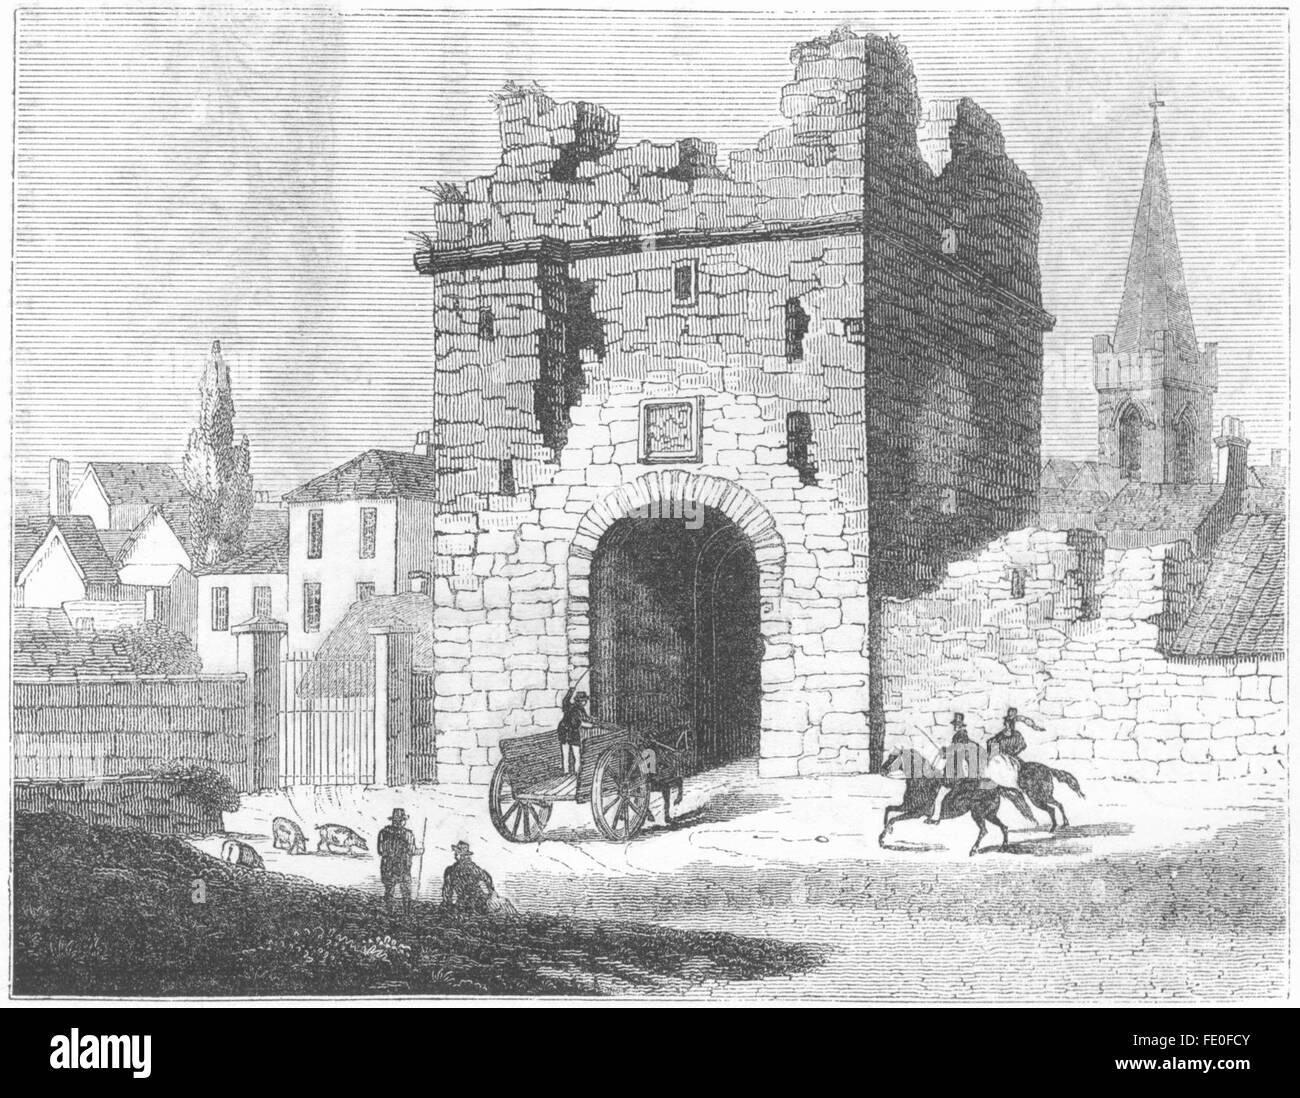 IRELAND: North gate, Athlone, Leinster, antique print 1845 - Stock Image